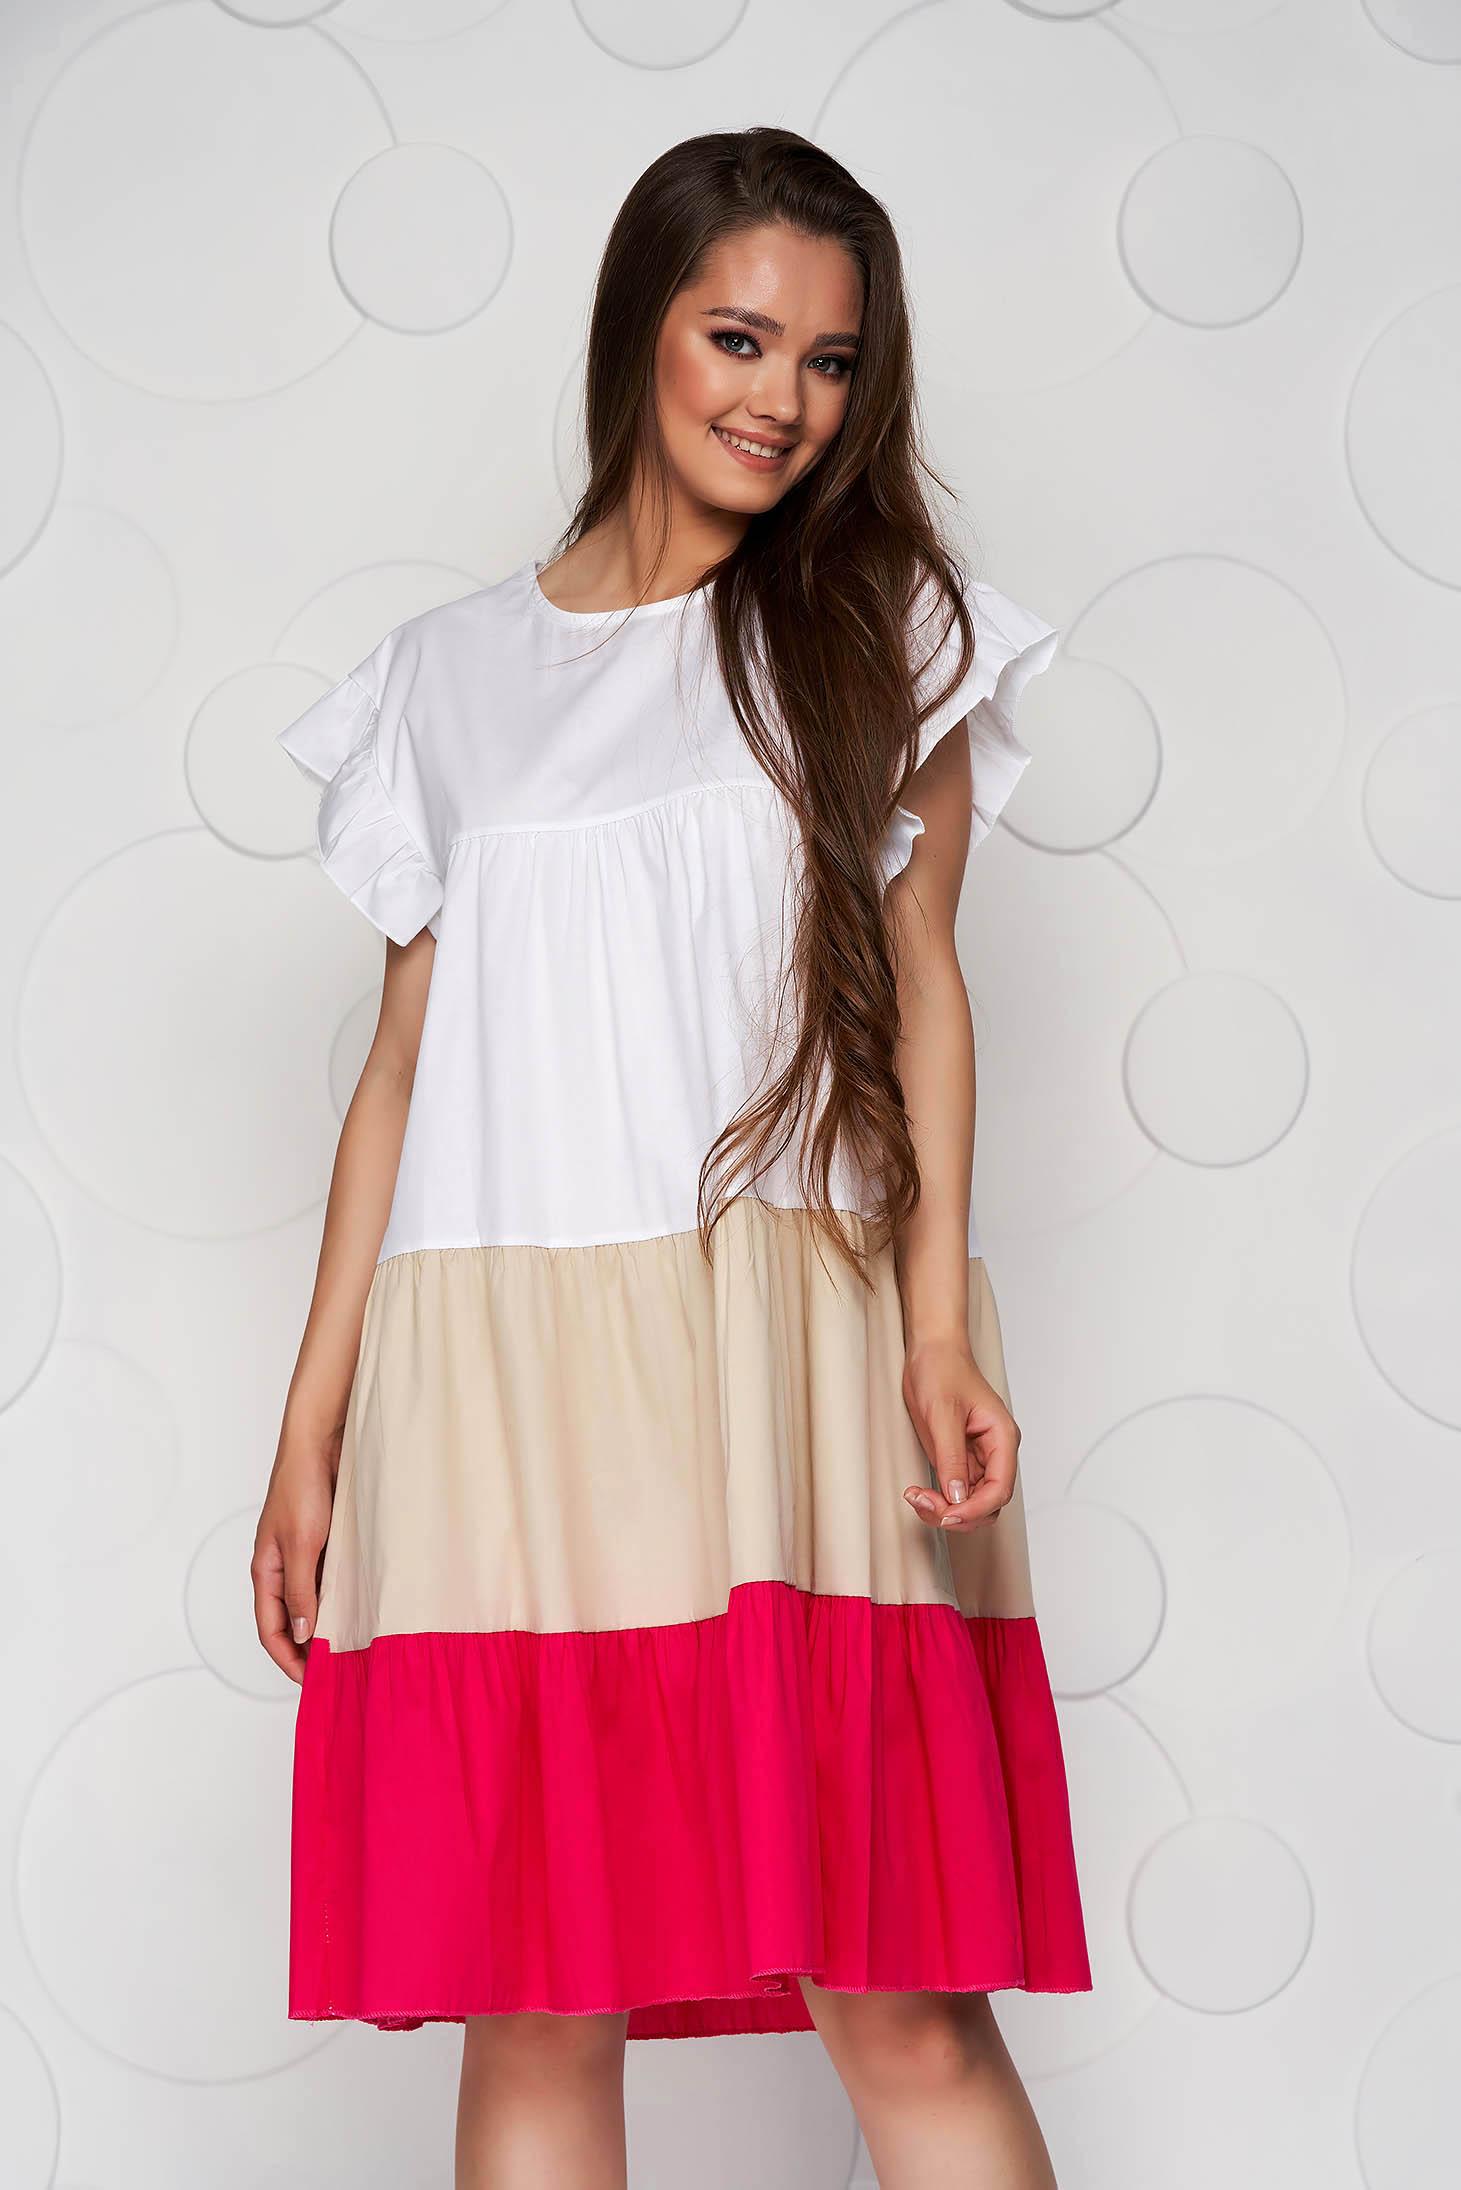 Rochie alba cu roz din material vaporos si subtire cu croi larg midi cu volanase